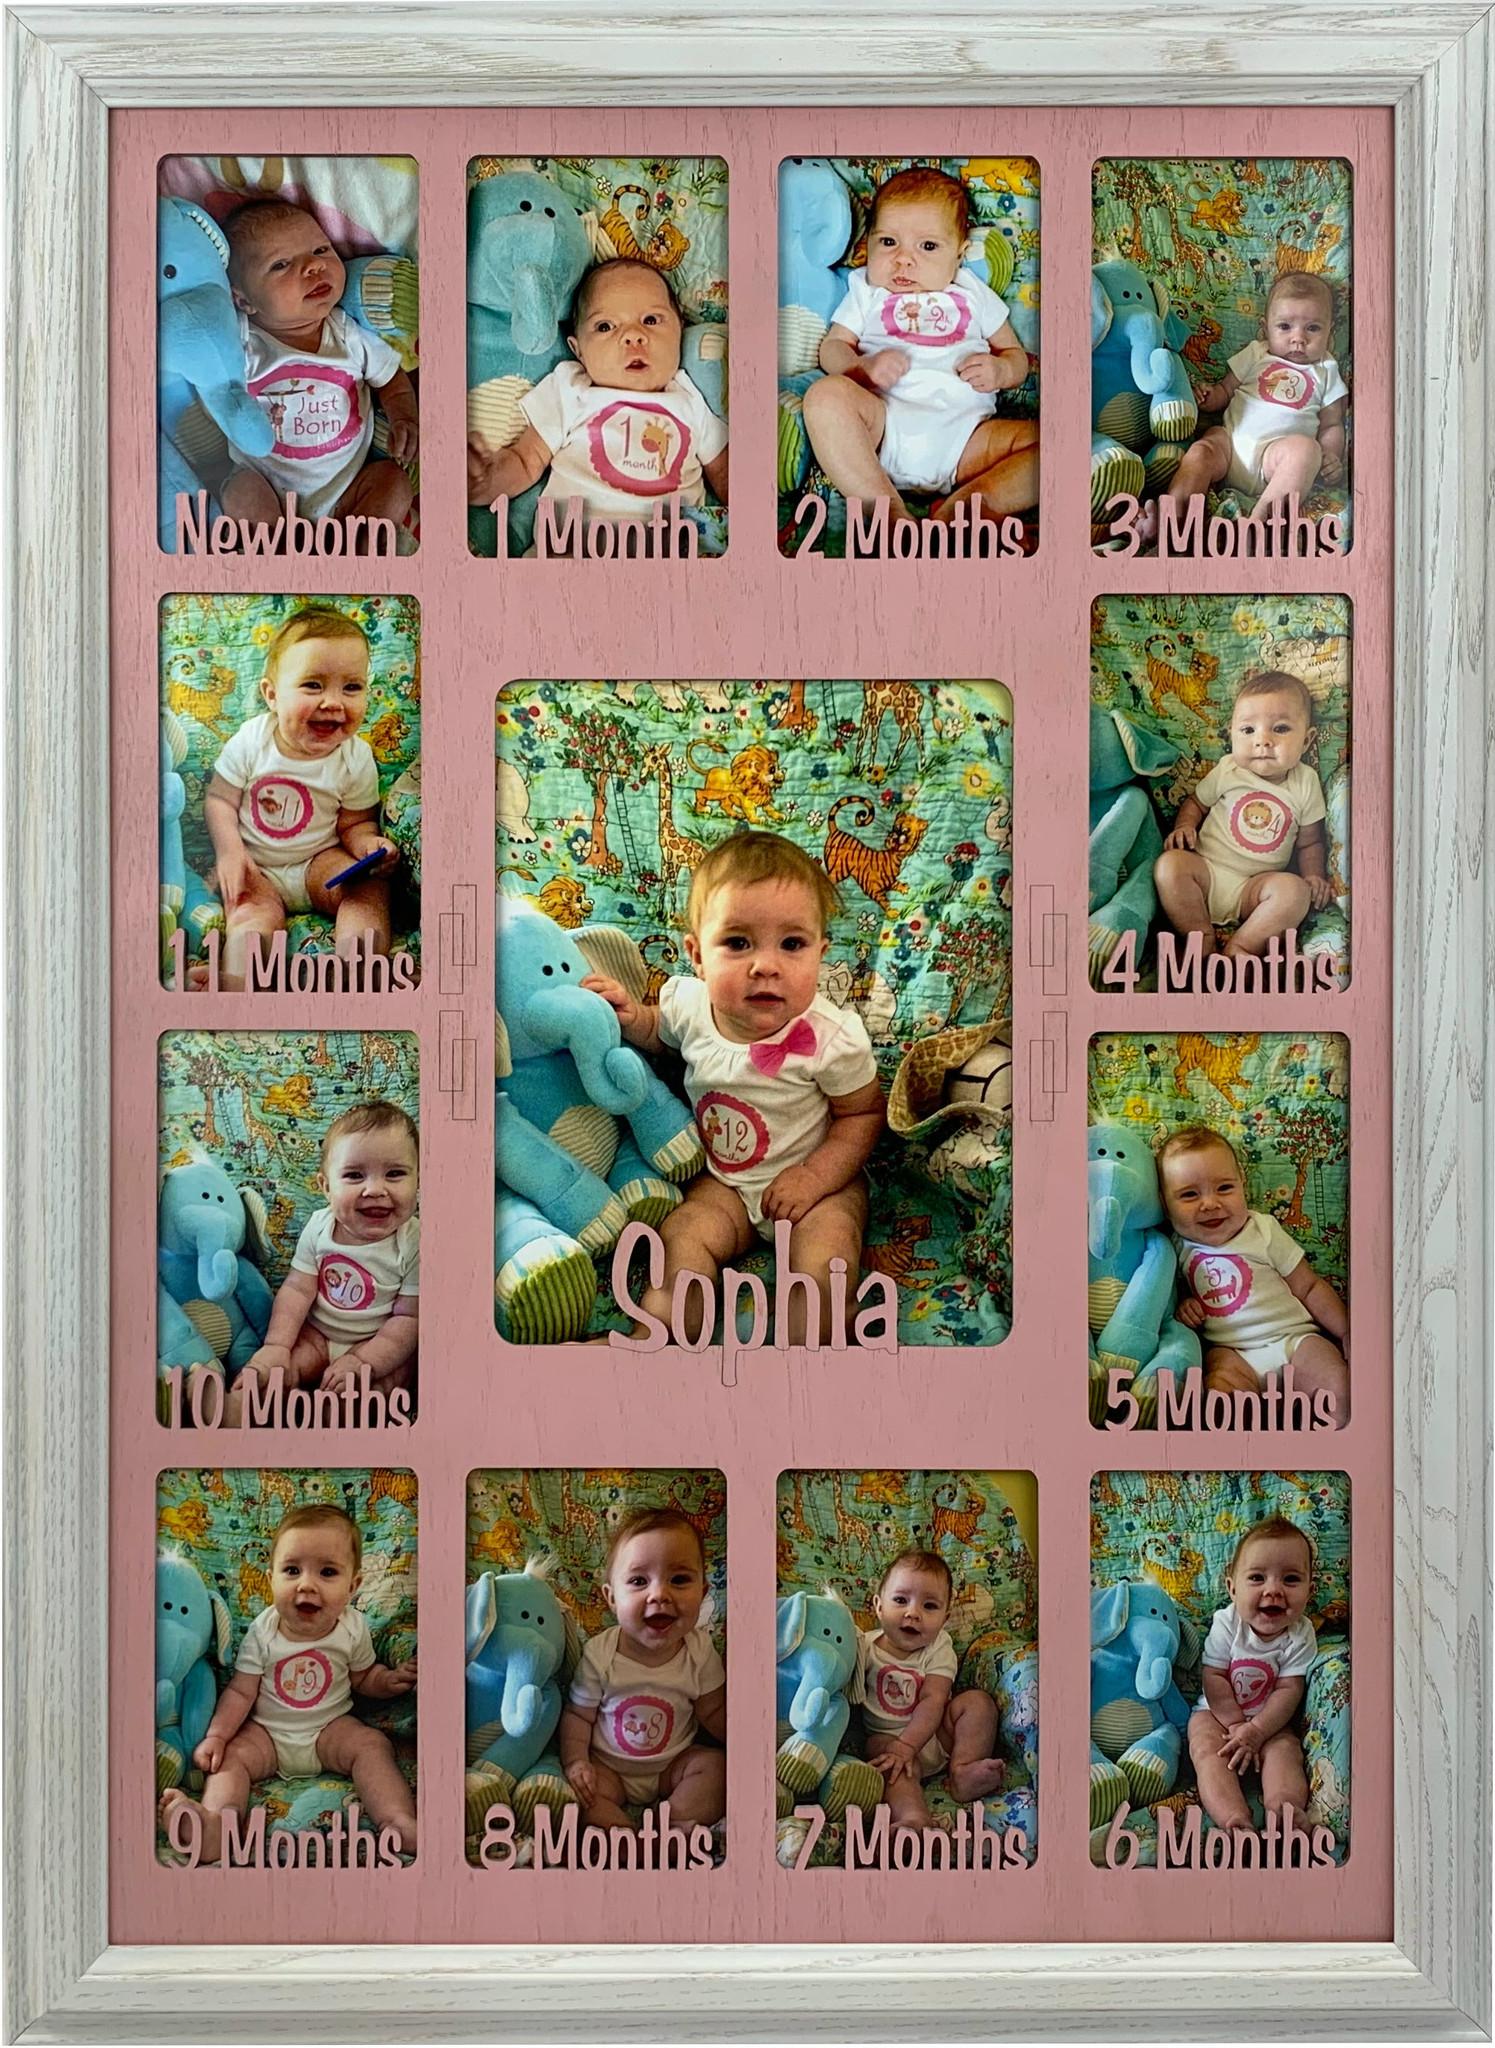 12 Month Photo Collage : month, photo, collage, Months, Picture, Frame, Collage, Personalized, Black, Matte, First, Talkingbread.co.il